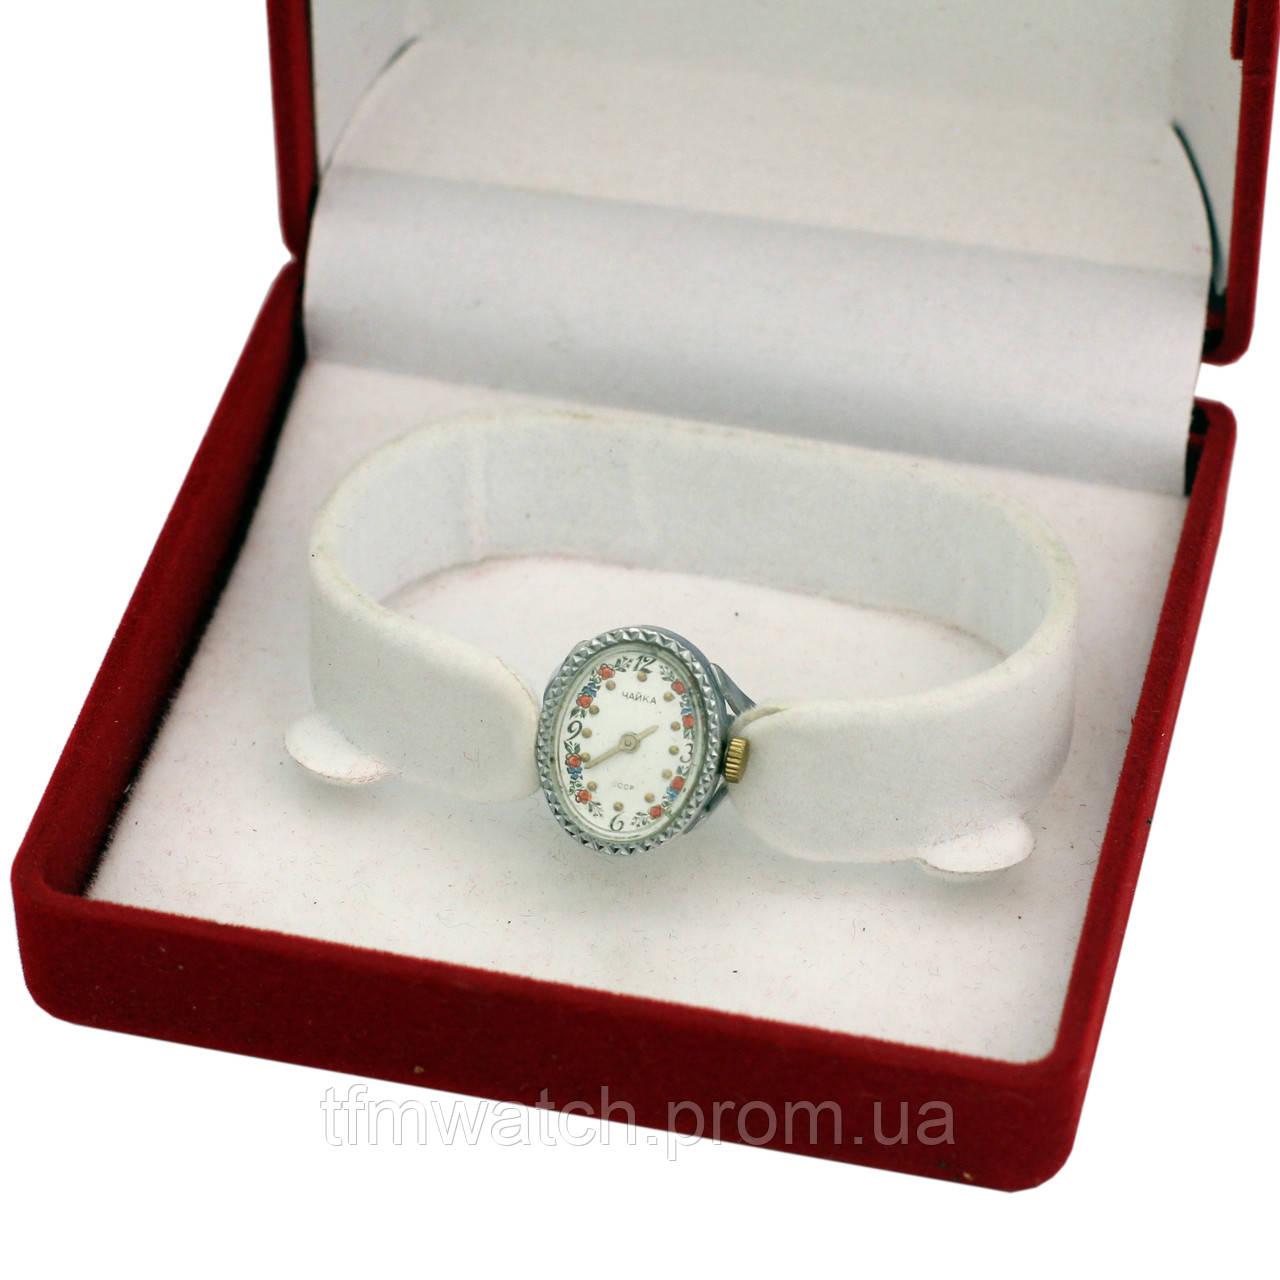 Чайка часы-кольцо